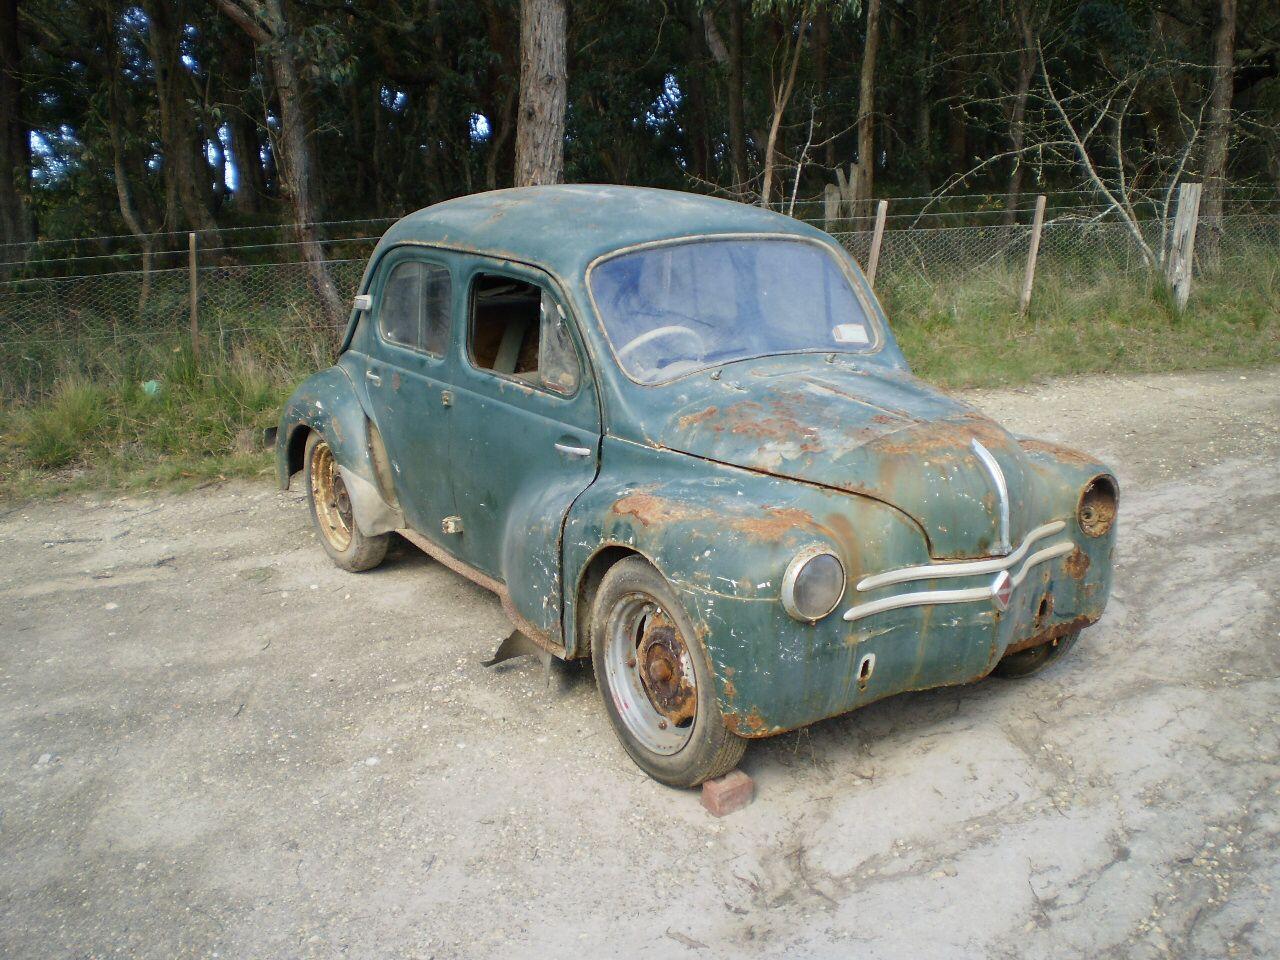 My Grandfathers Renault 4cv Voitures Abandonnees Voiture Renault